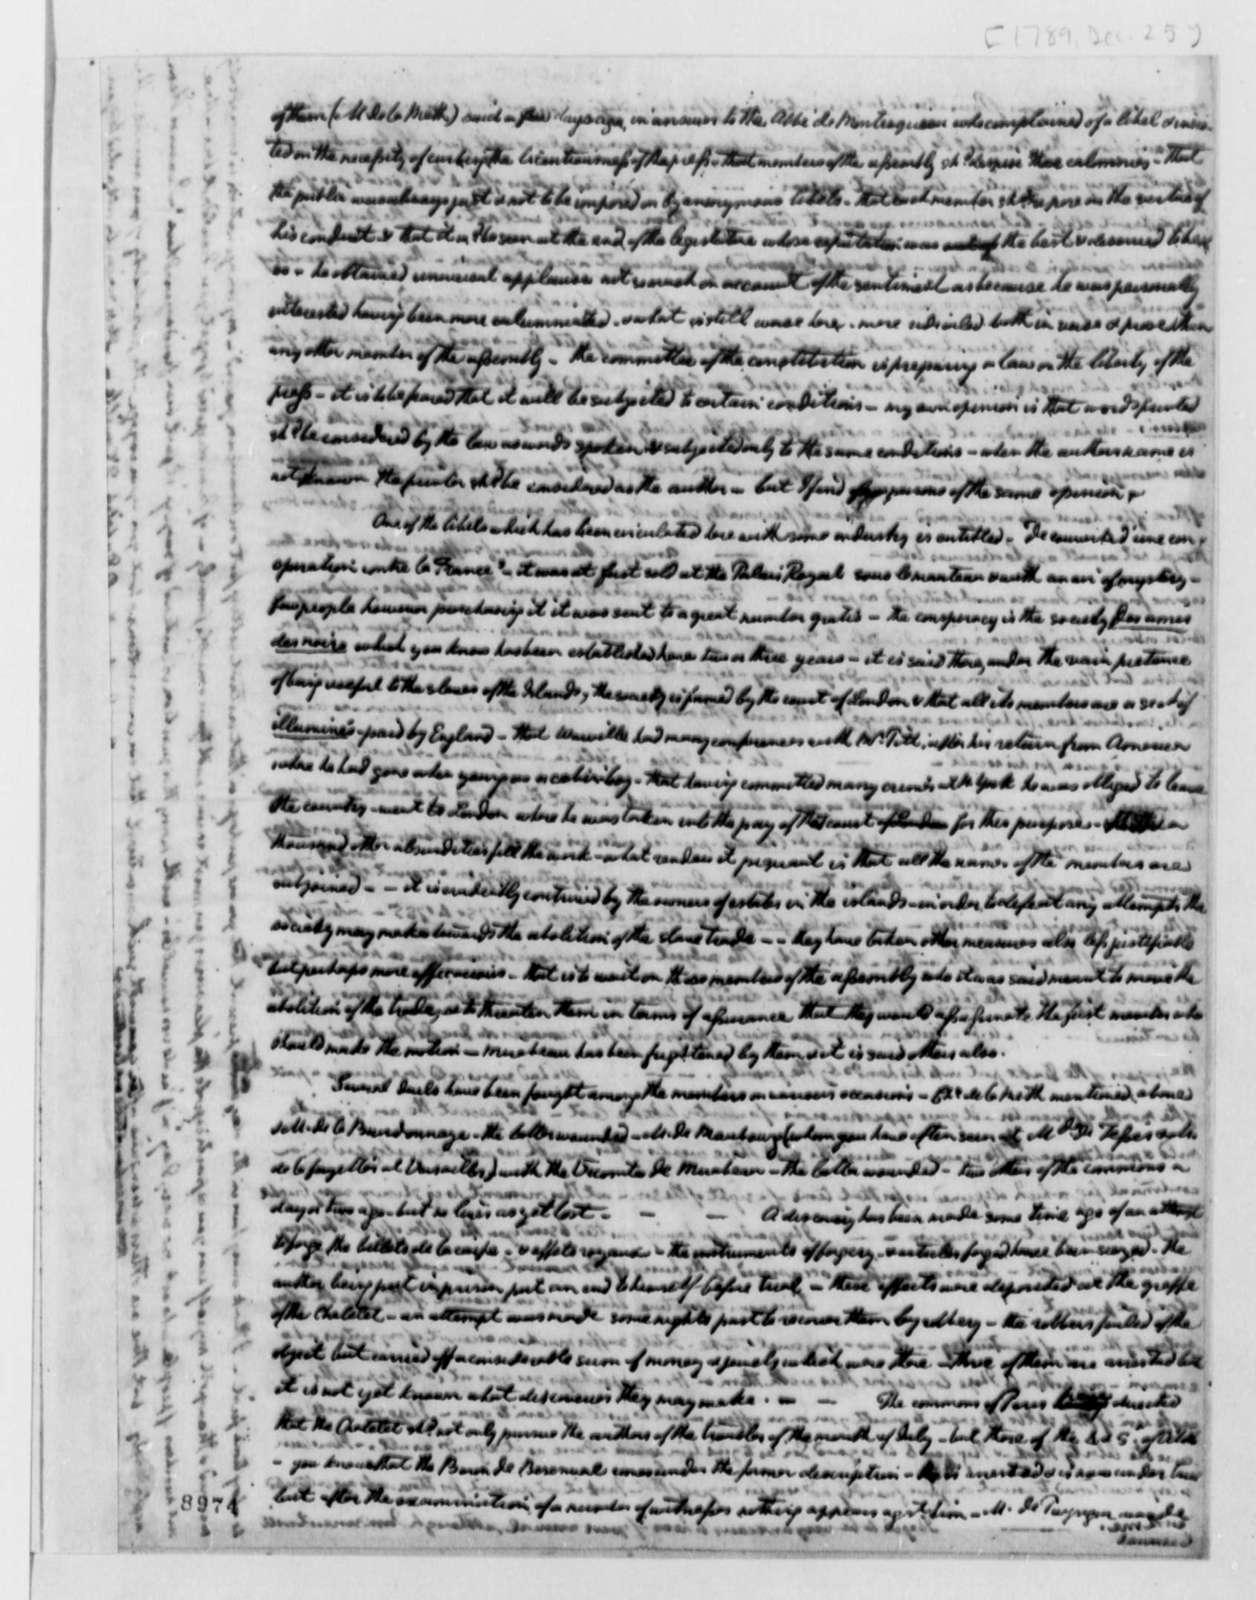 William Short to Thomas Jefferson, December 25, 1789